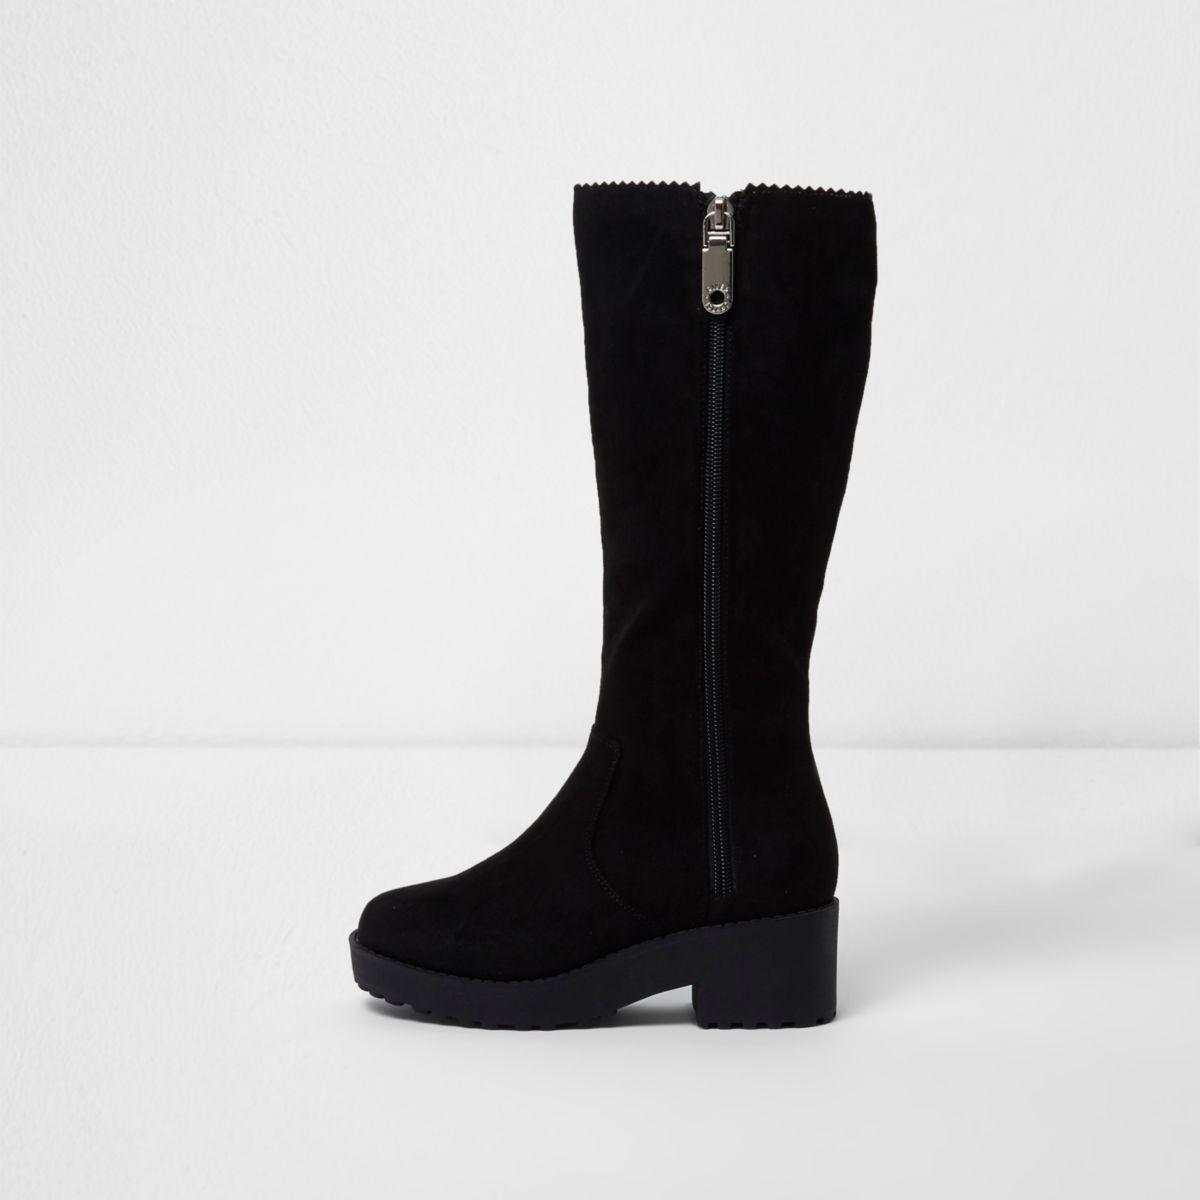 Girls chunky black knee high boots